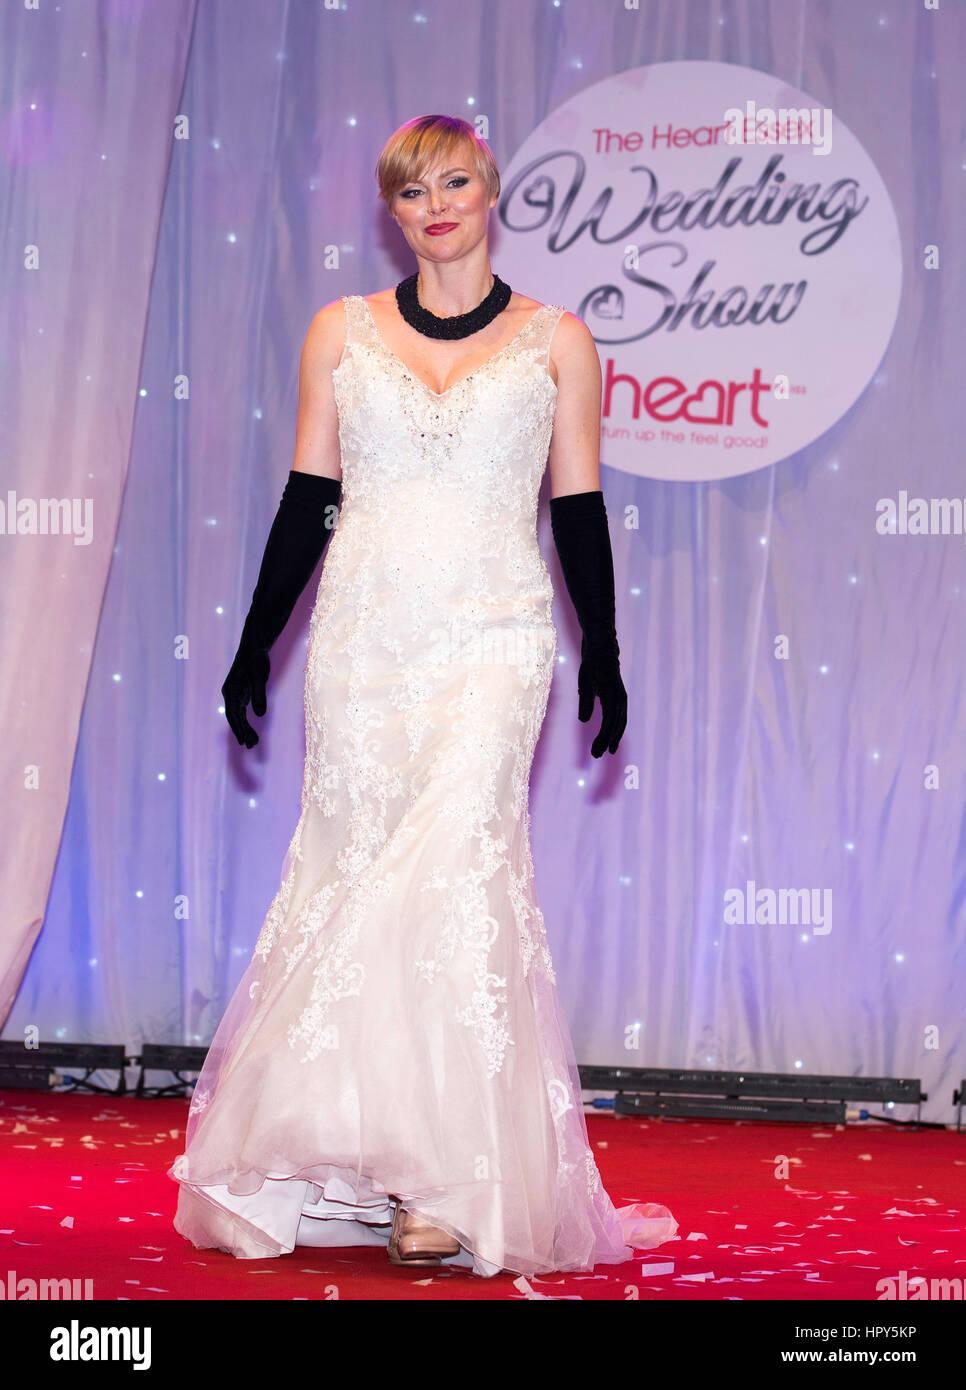 Wedding Show Stock Photos & Wedding Show Stock Images - Alamy